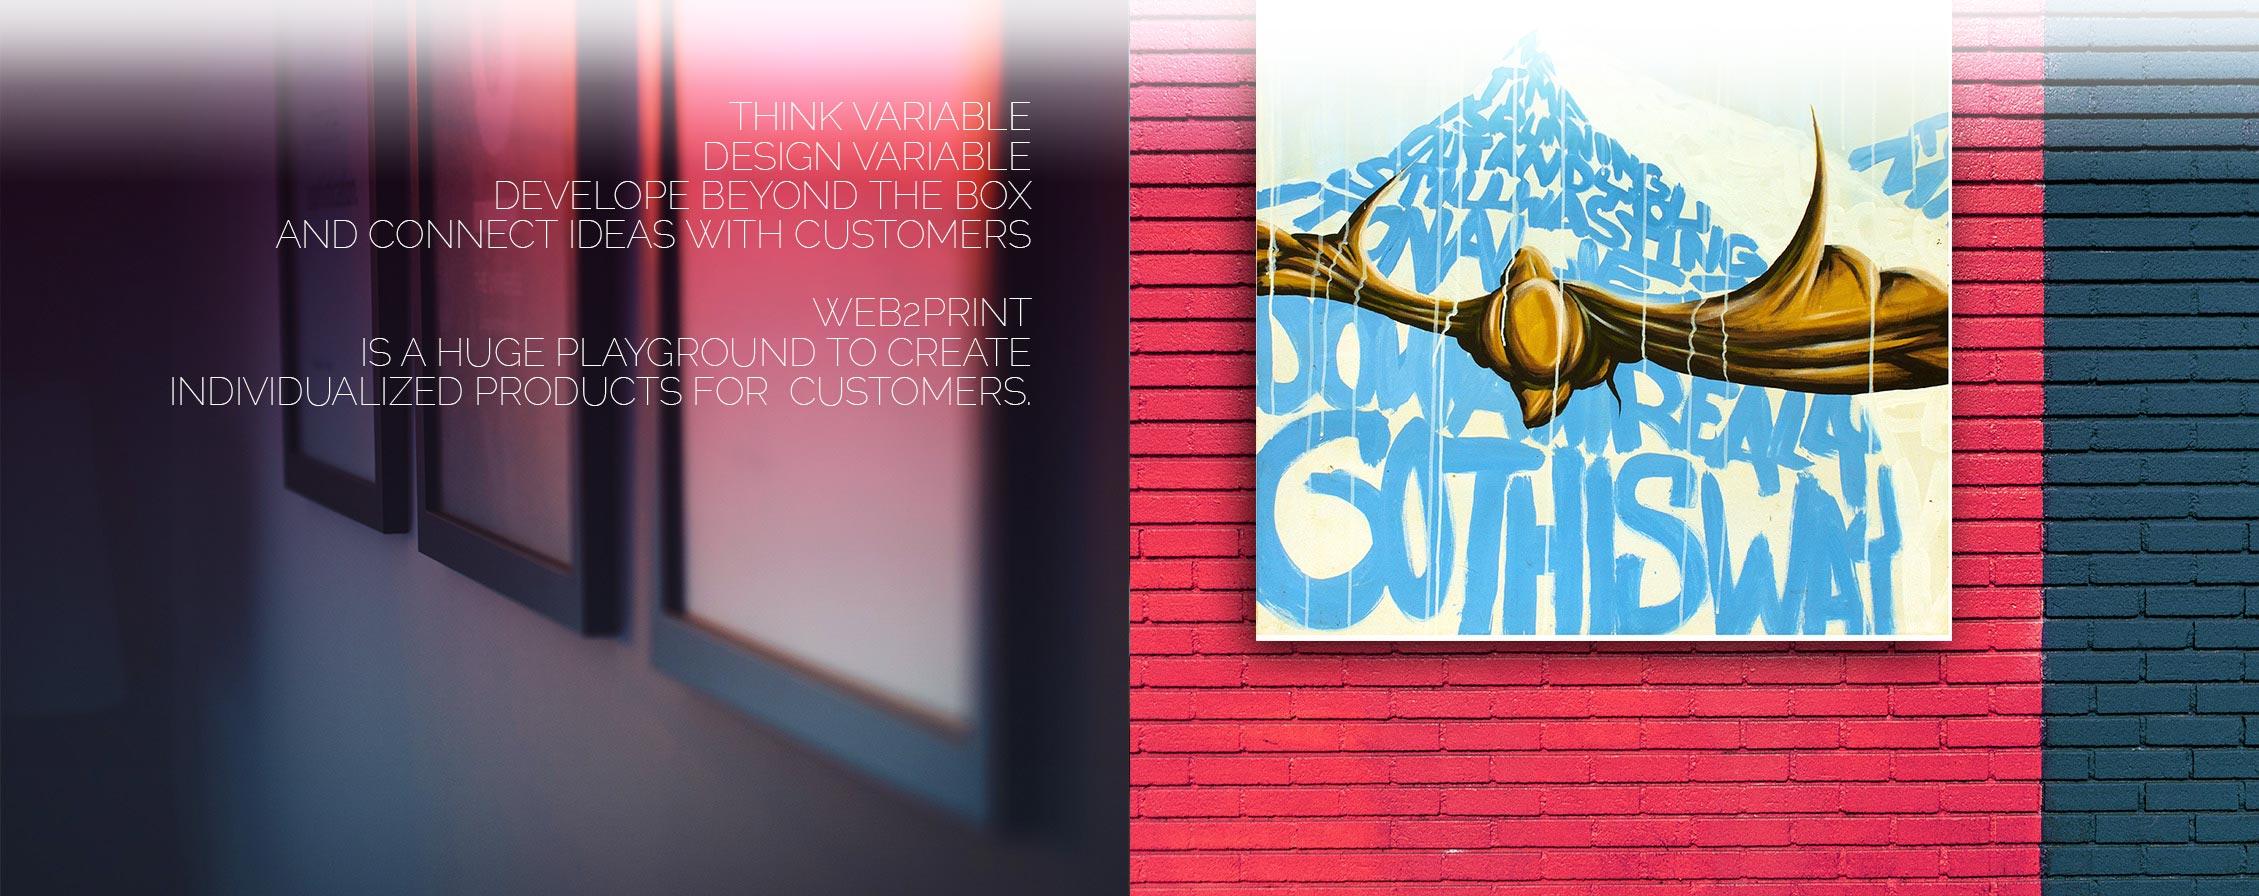 webtoprint web2print agentur templates muenchen agentur v3